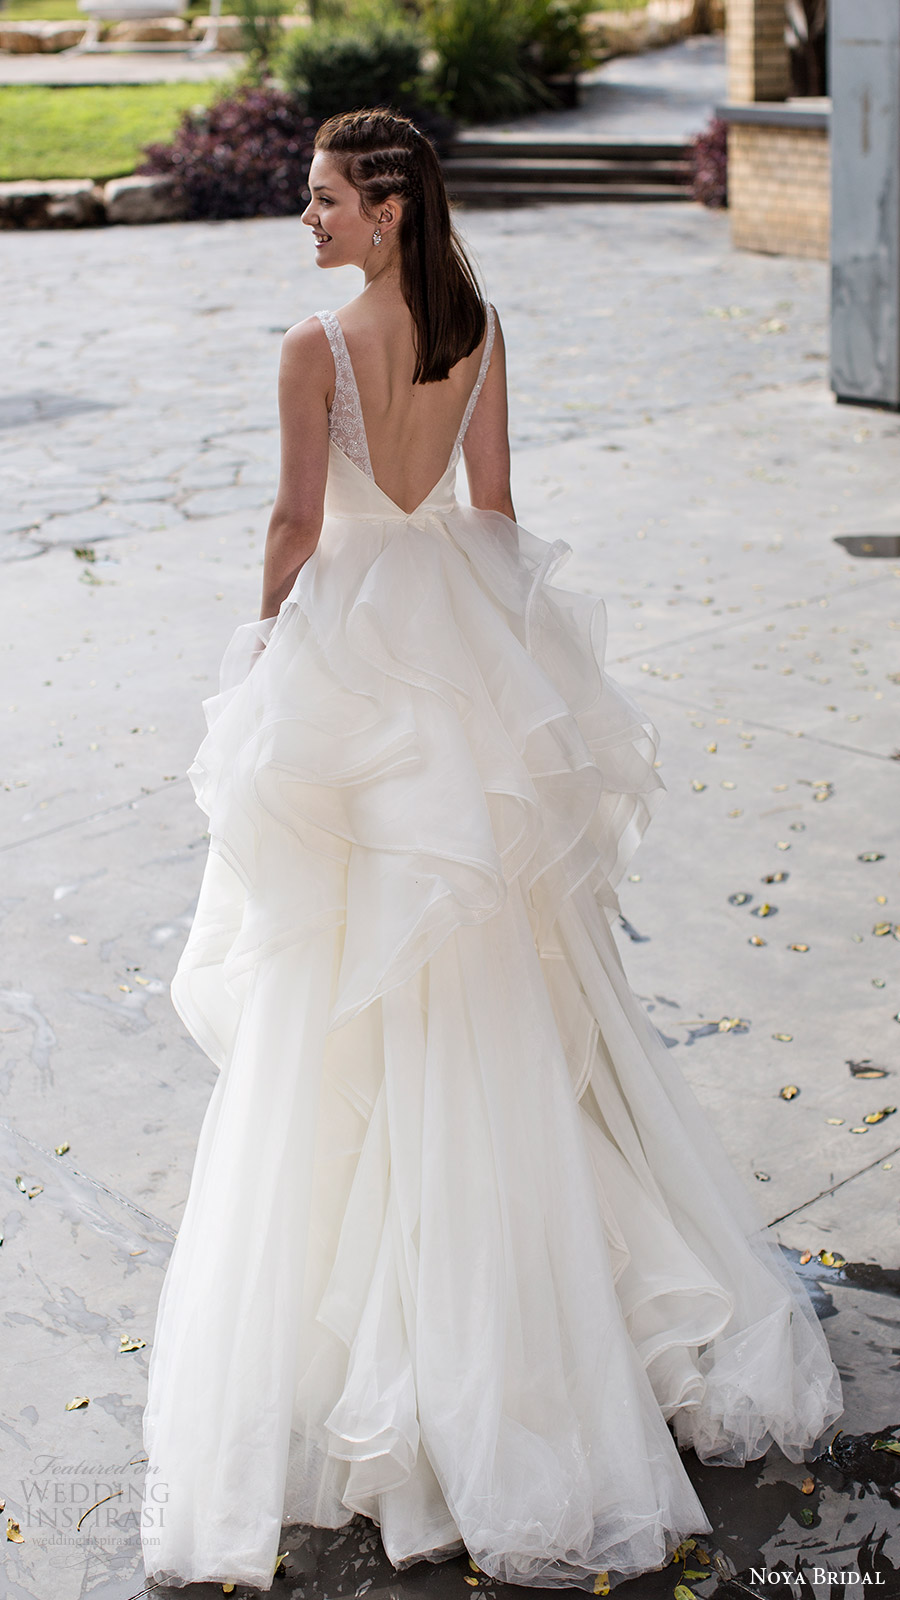 noya bridal 2016 sleeveless straps vneck aline ball gown wedding dress (1209) romantic princess bv